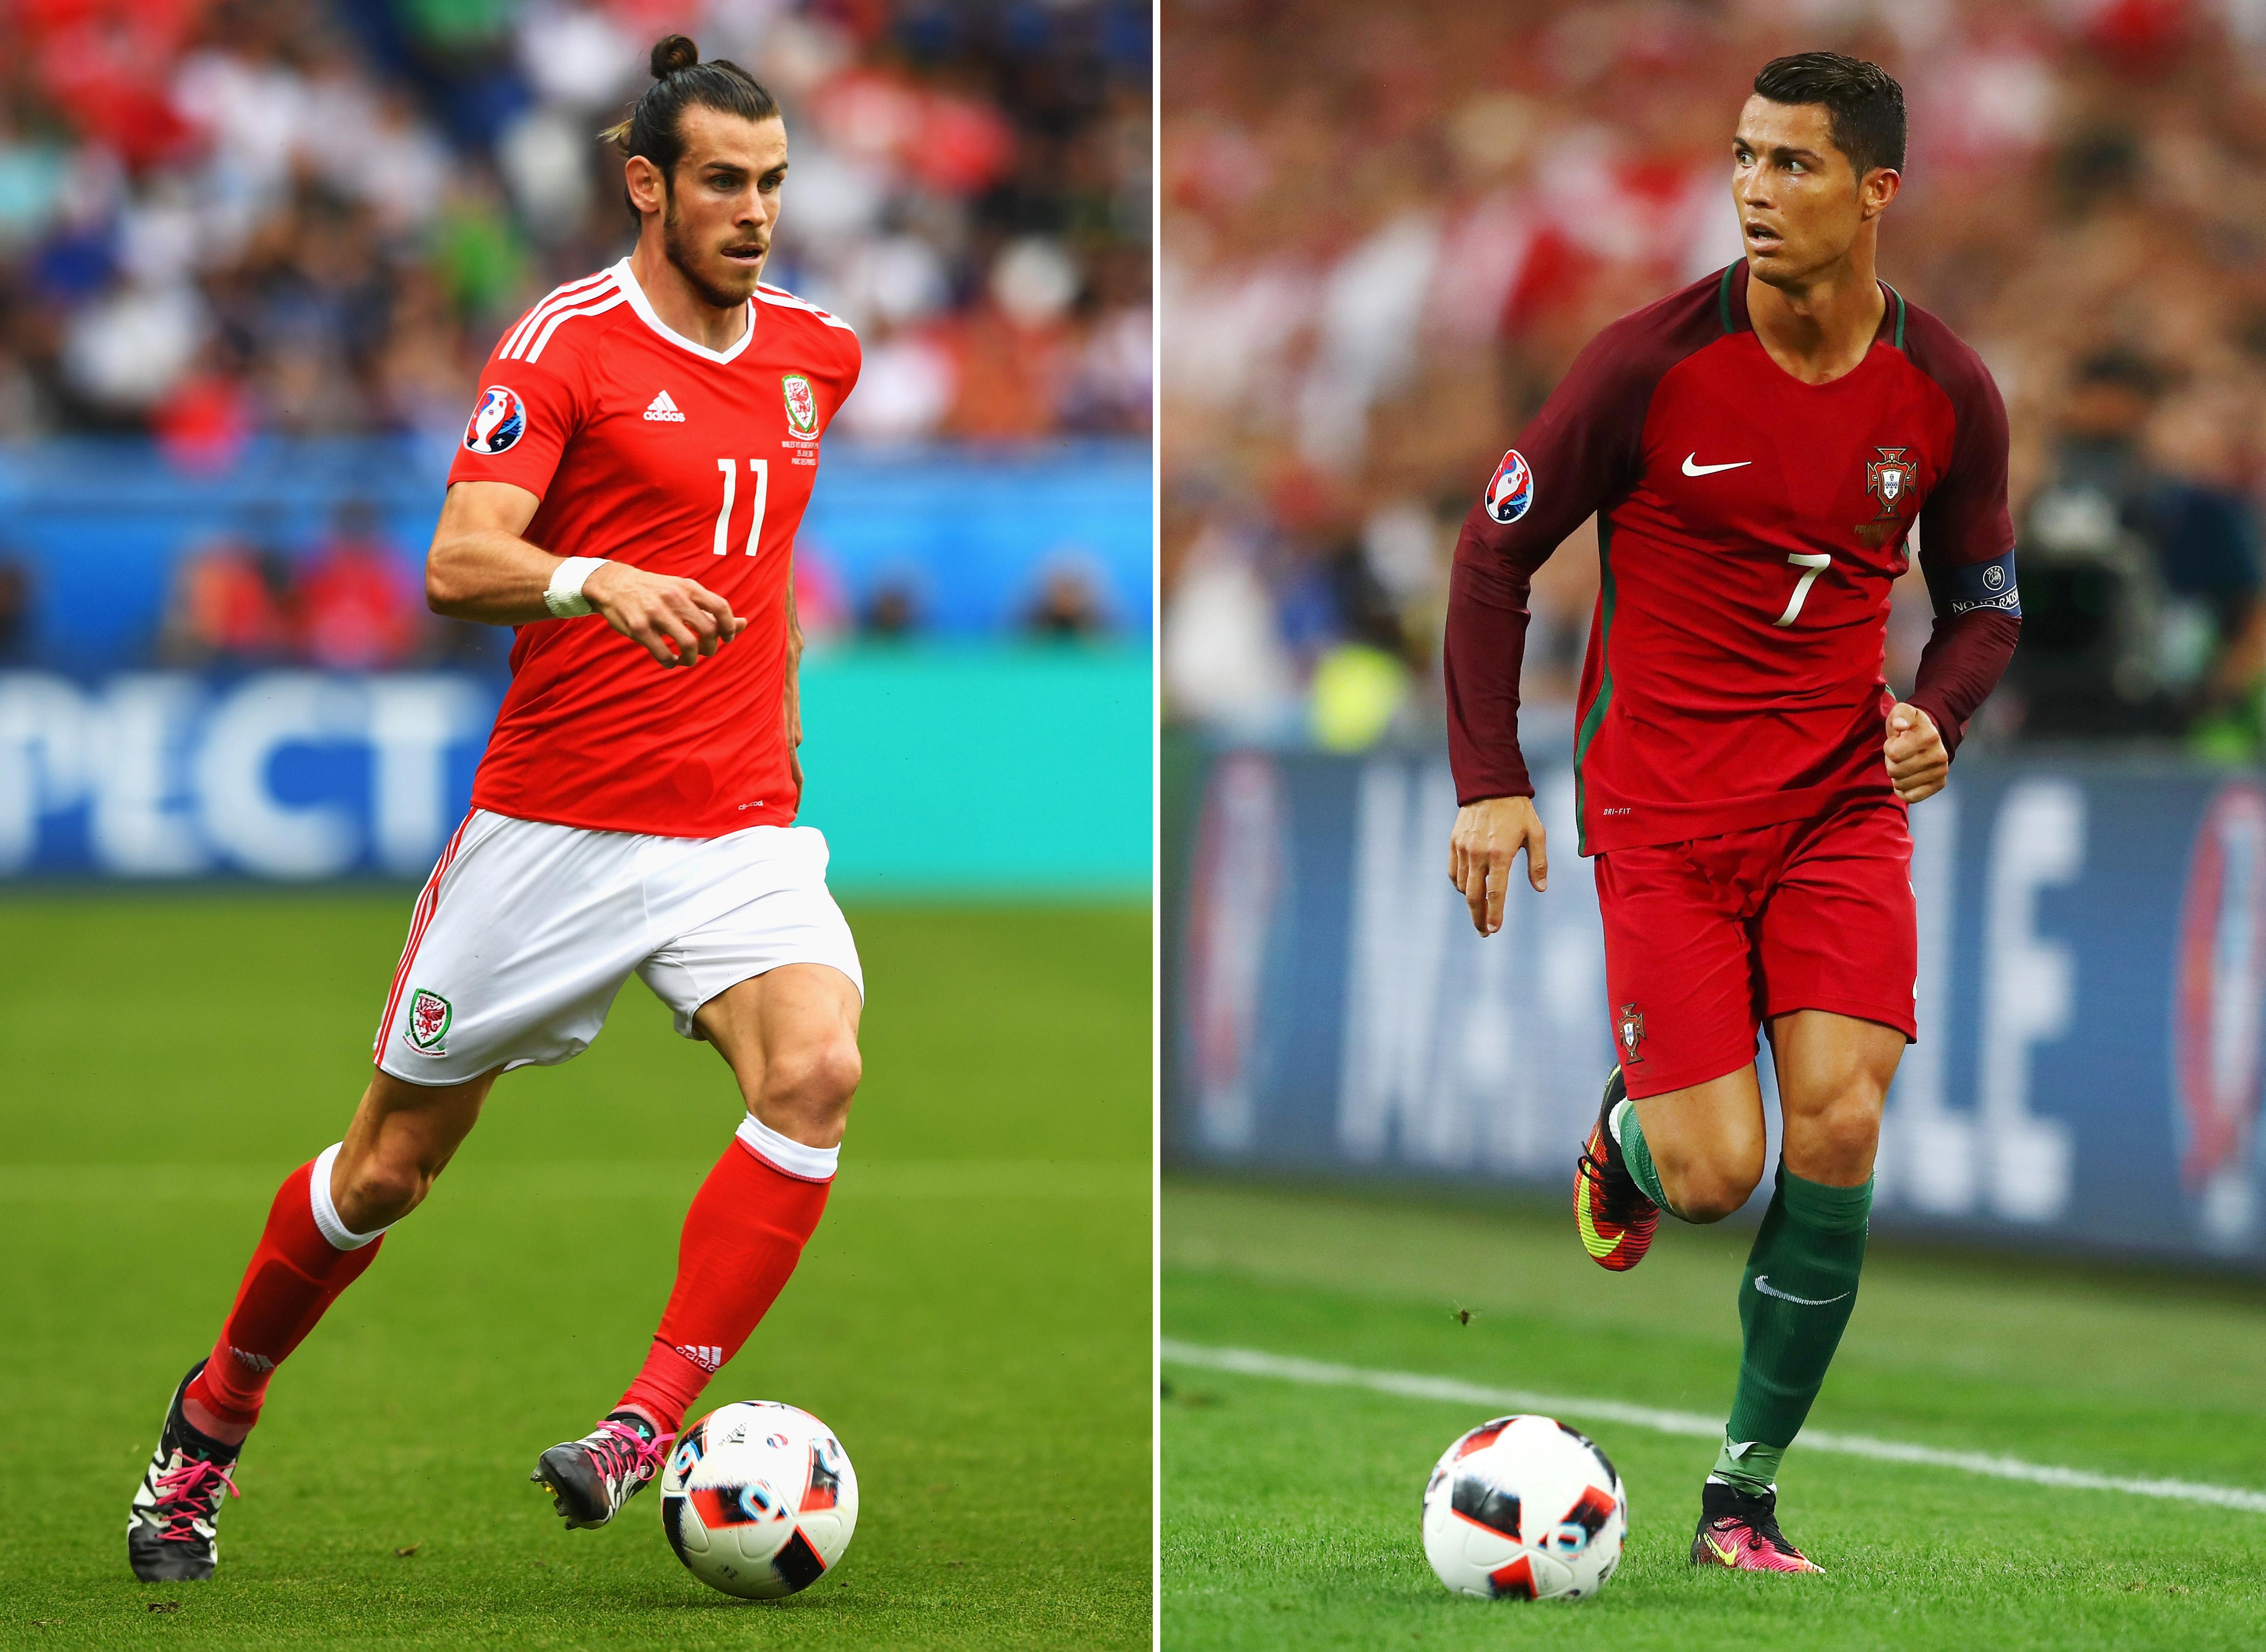 Wales v Portugal - Semi Final: UEFA Euro 2016